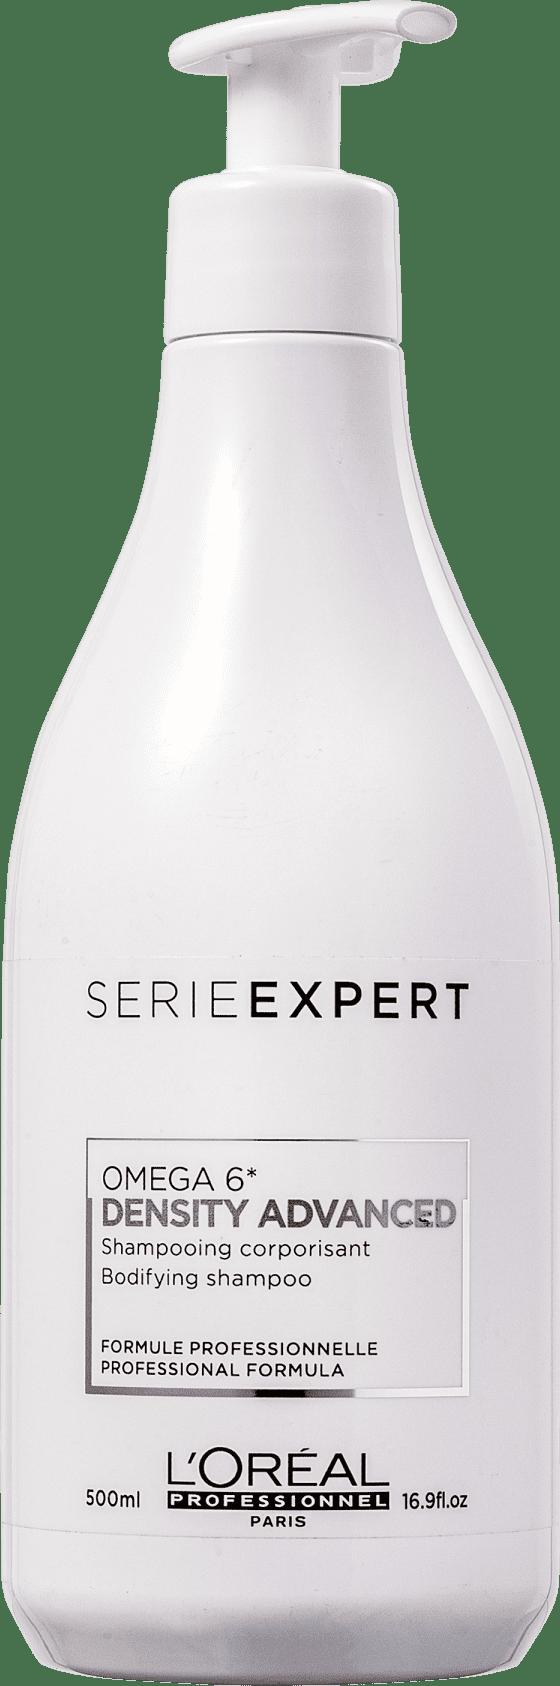 Shampoo Density Advanced 500ml Loreal